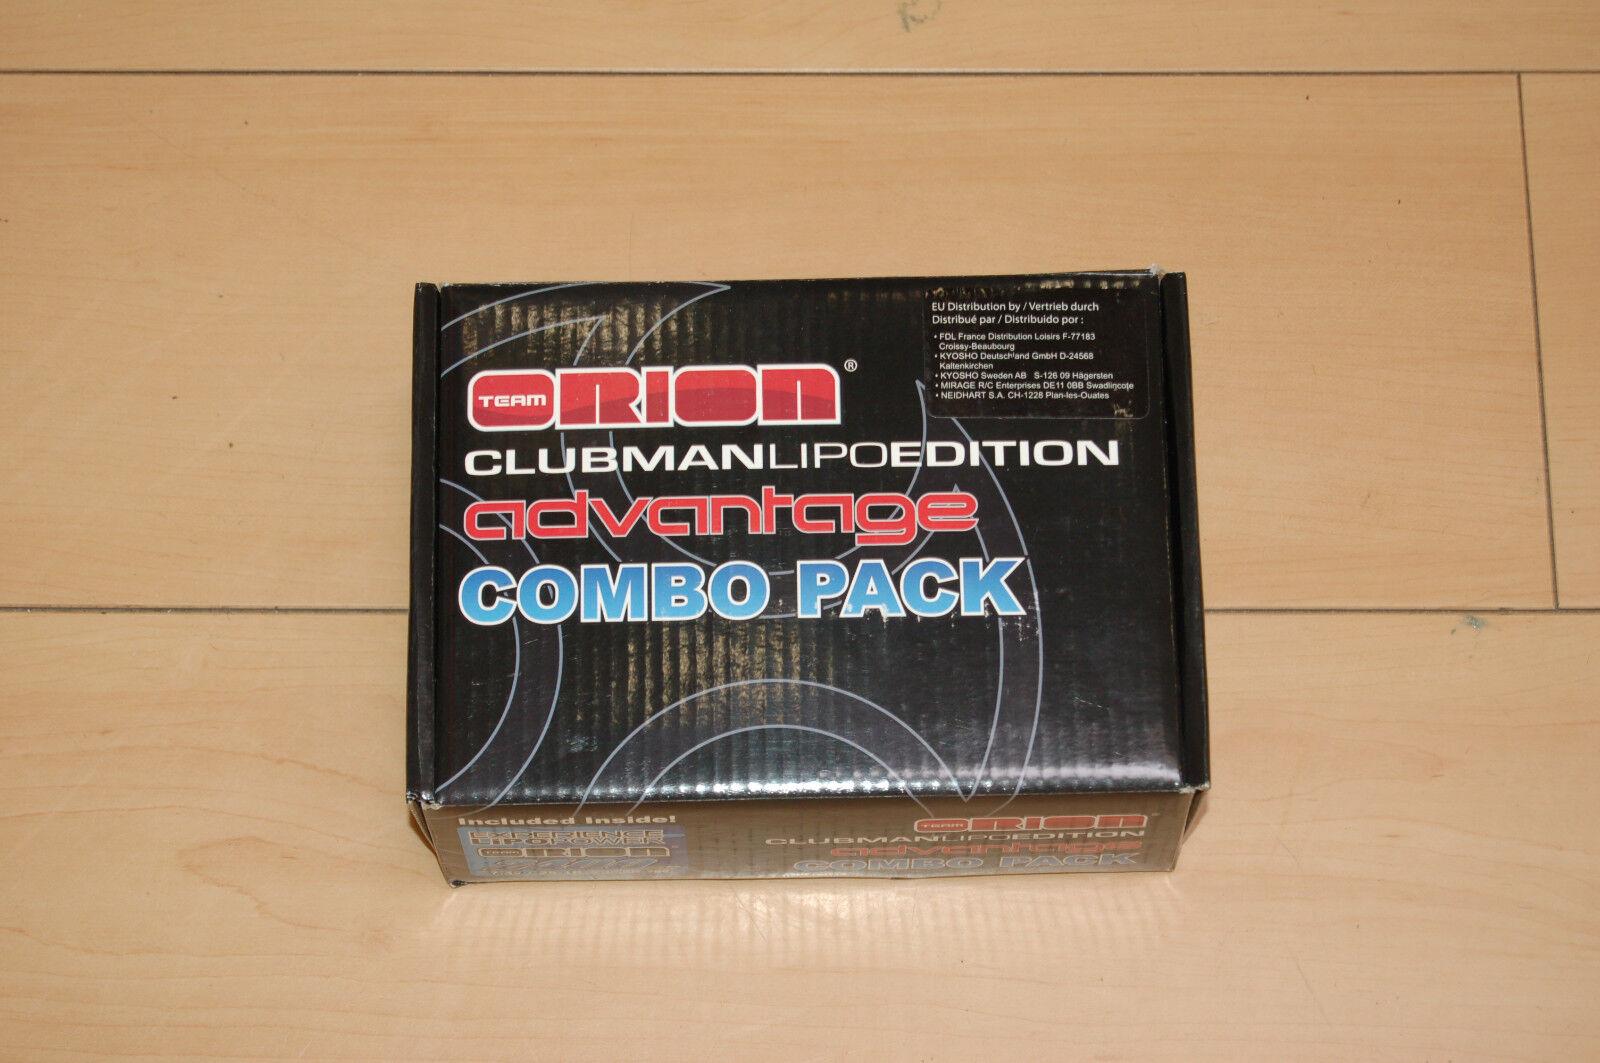 Team Orion ori30124 combo pack lipo 2400mah 7,4v +, estación de carga, nuevo embalaje original &